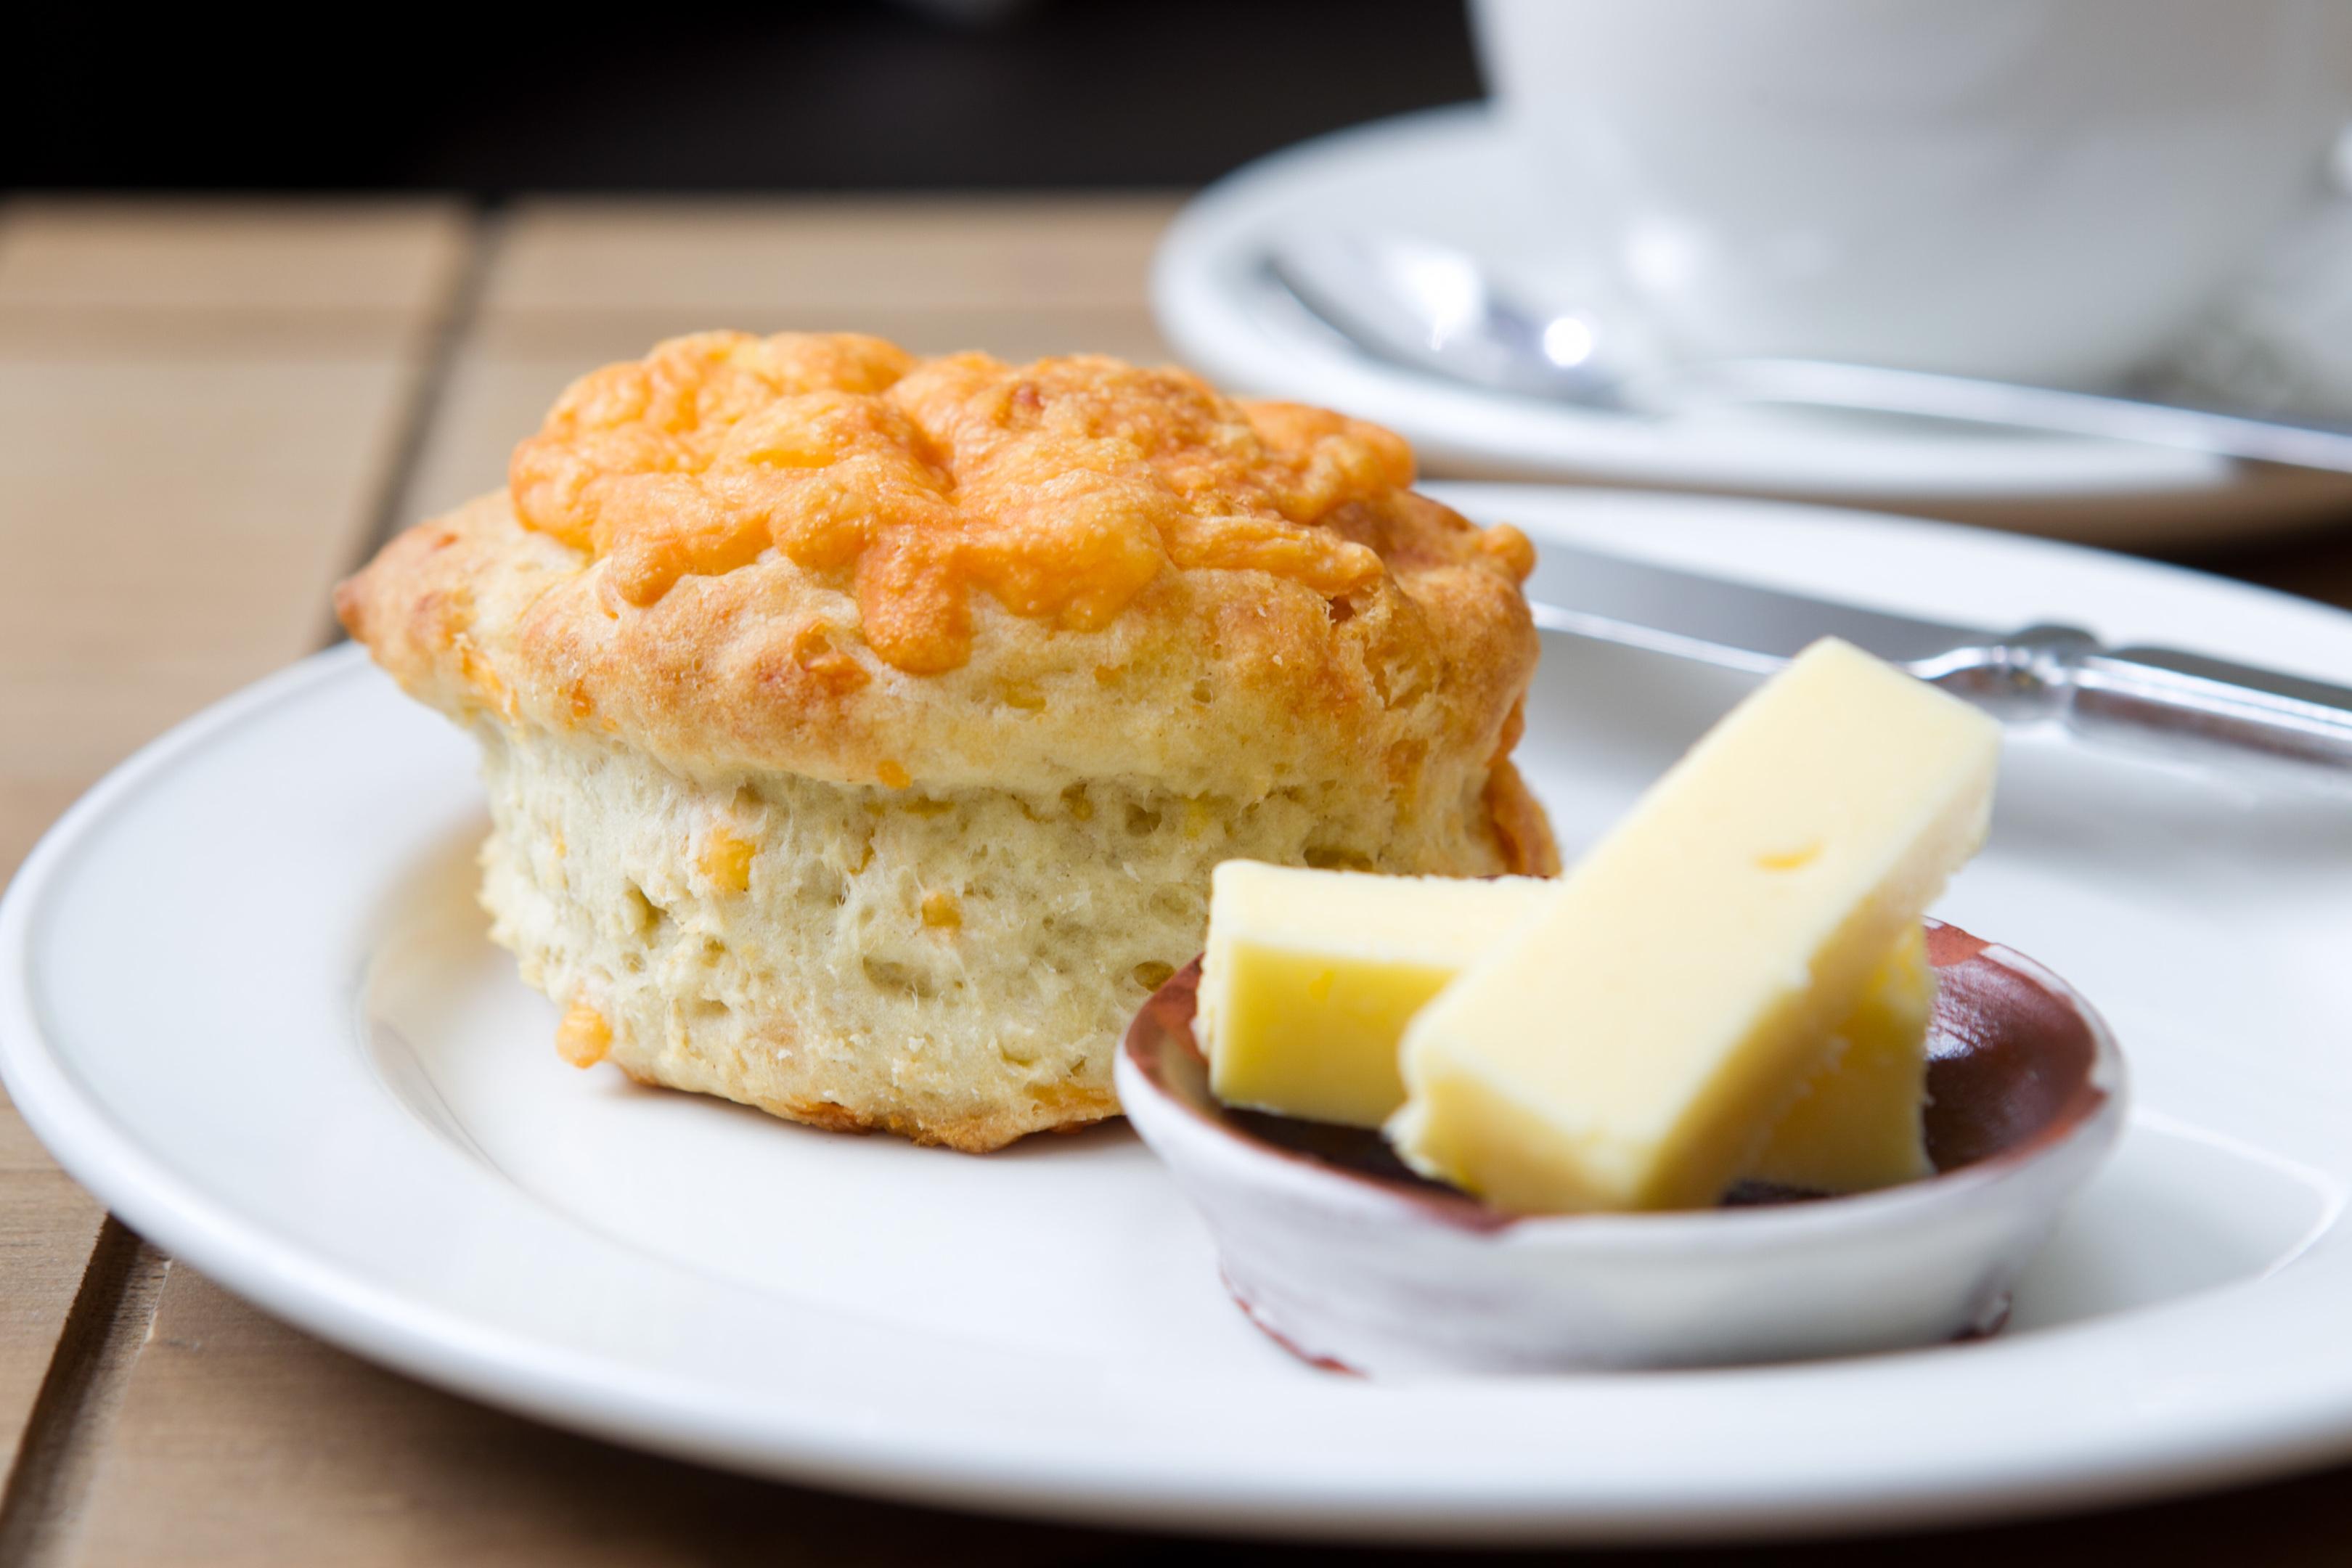 Corbenic Cafe's cheese scone (Andrew Cawley / DC Thomson)